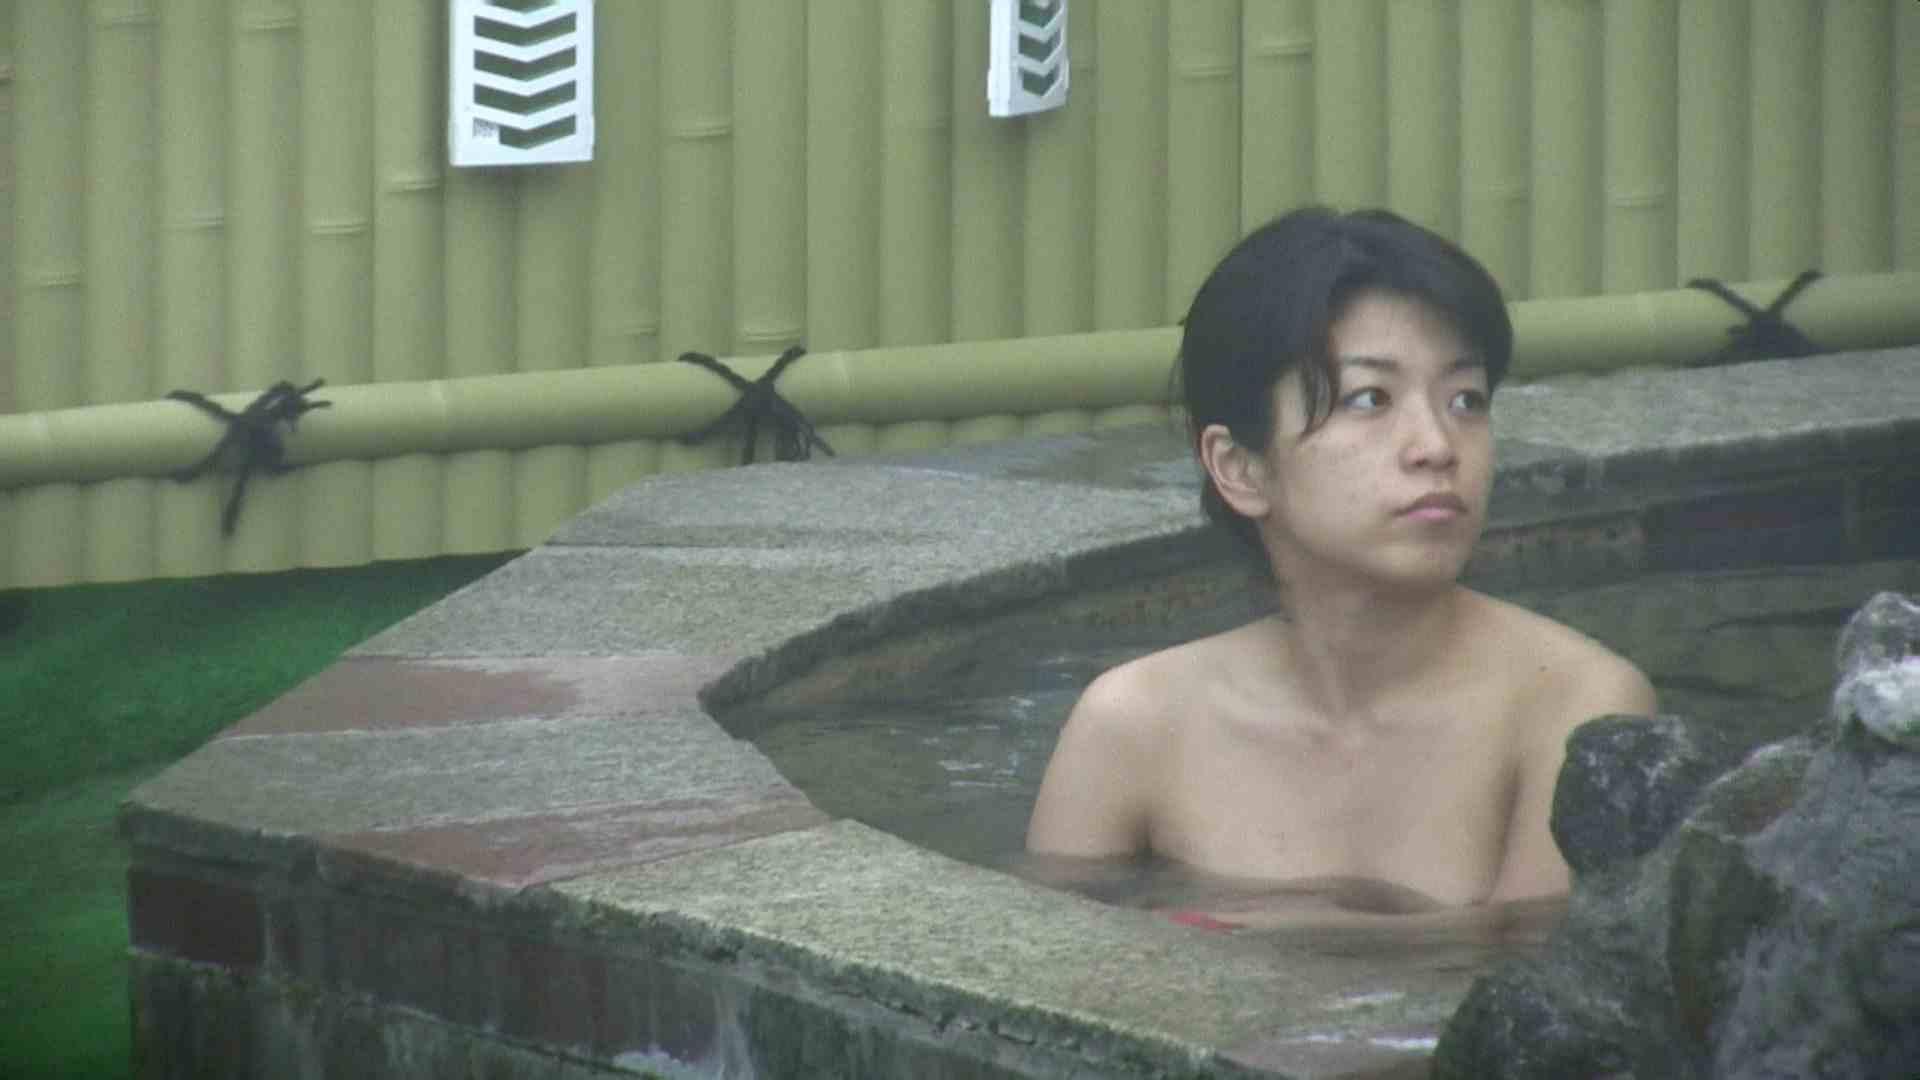 Aquaな露天風呂Vol.585 露天 アダルト動画キャプチャ 78PICs 20